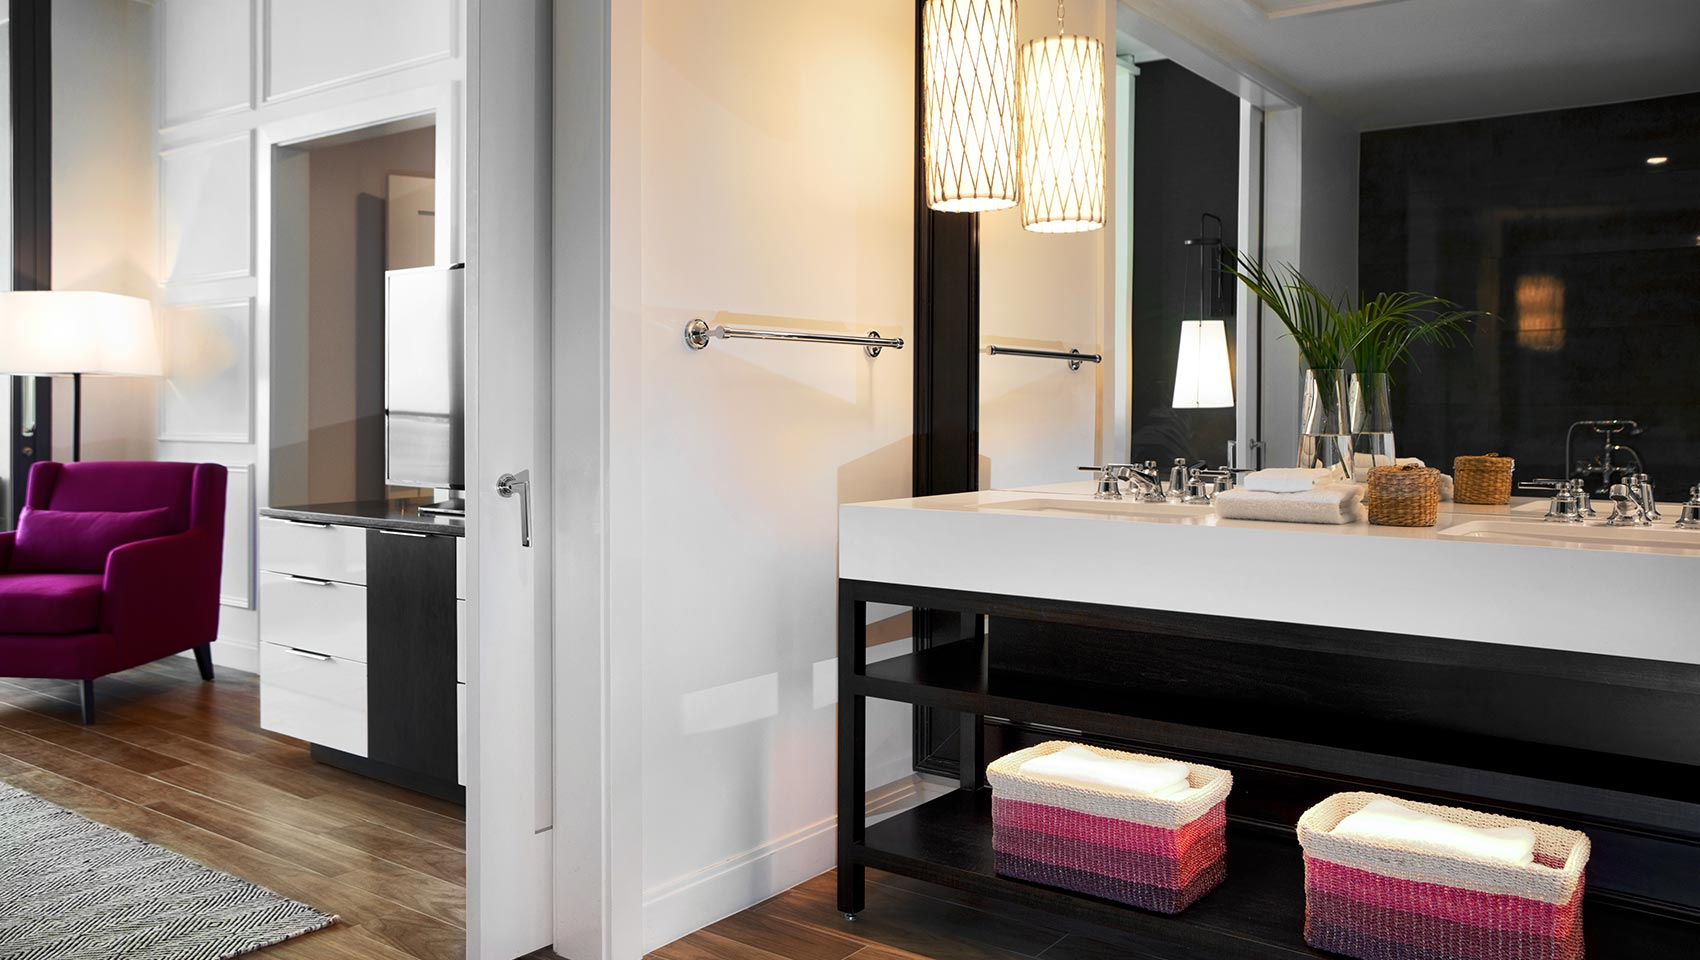 Bathroom vanities, mirrors, wall paneling and trim.